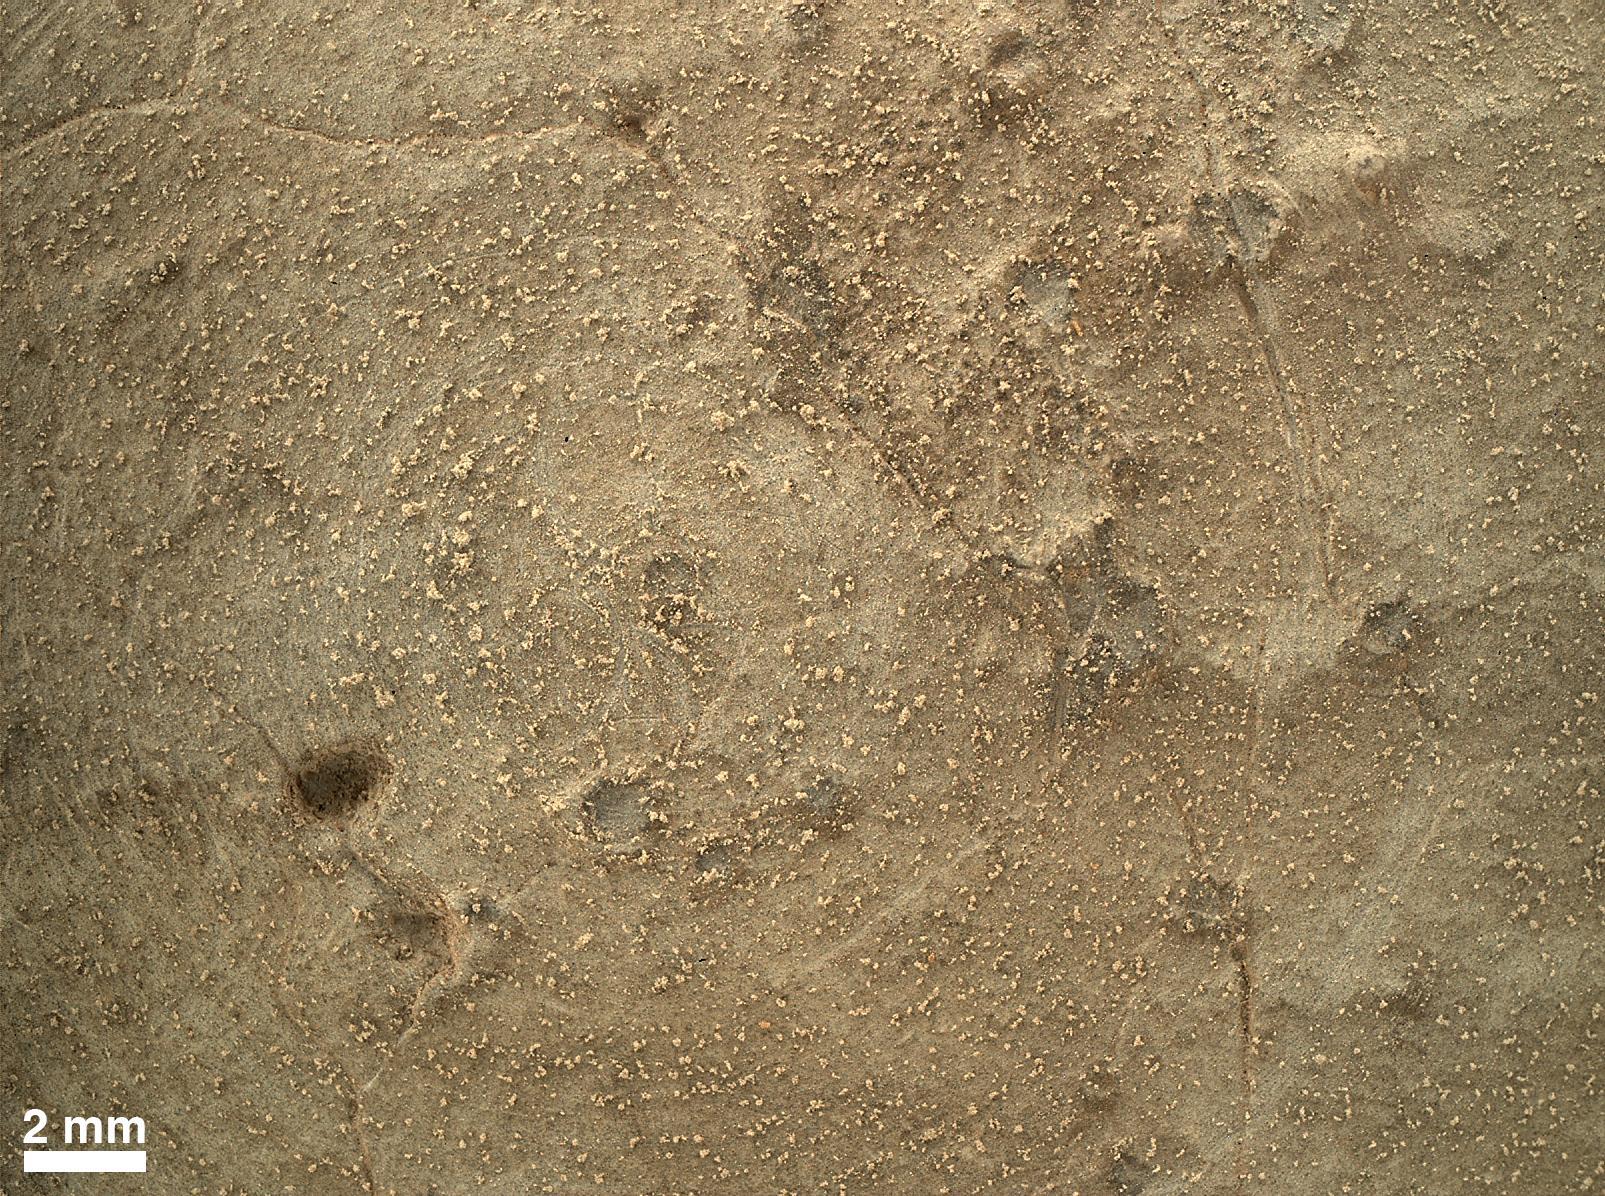 MAHLI-Nauaufnahme der gefegten Oberflaeche, Quelle: NASA/JPL-CalTech/MSSS